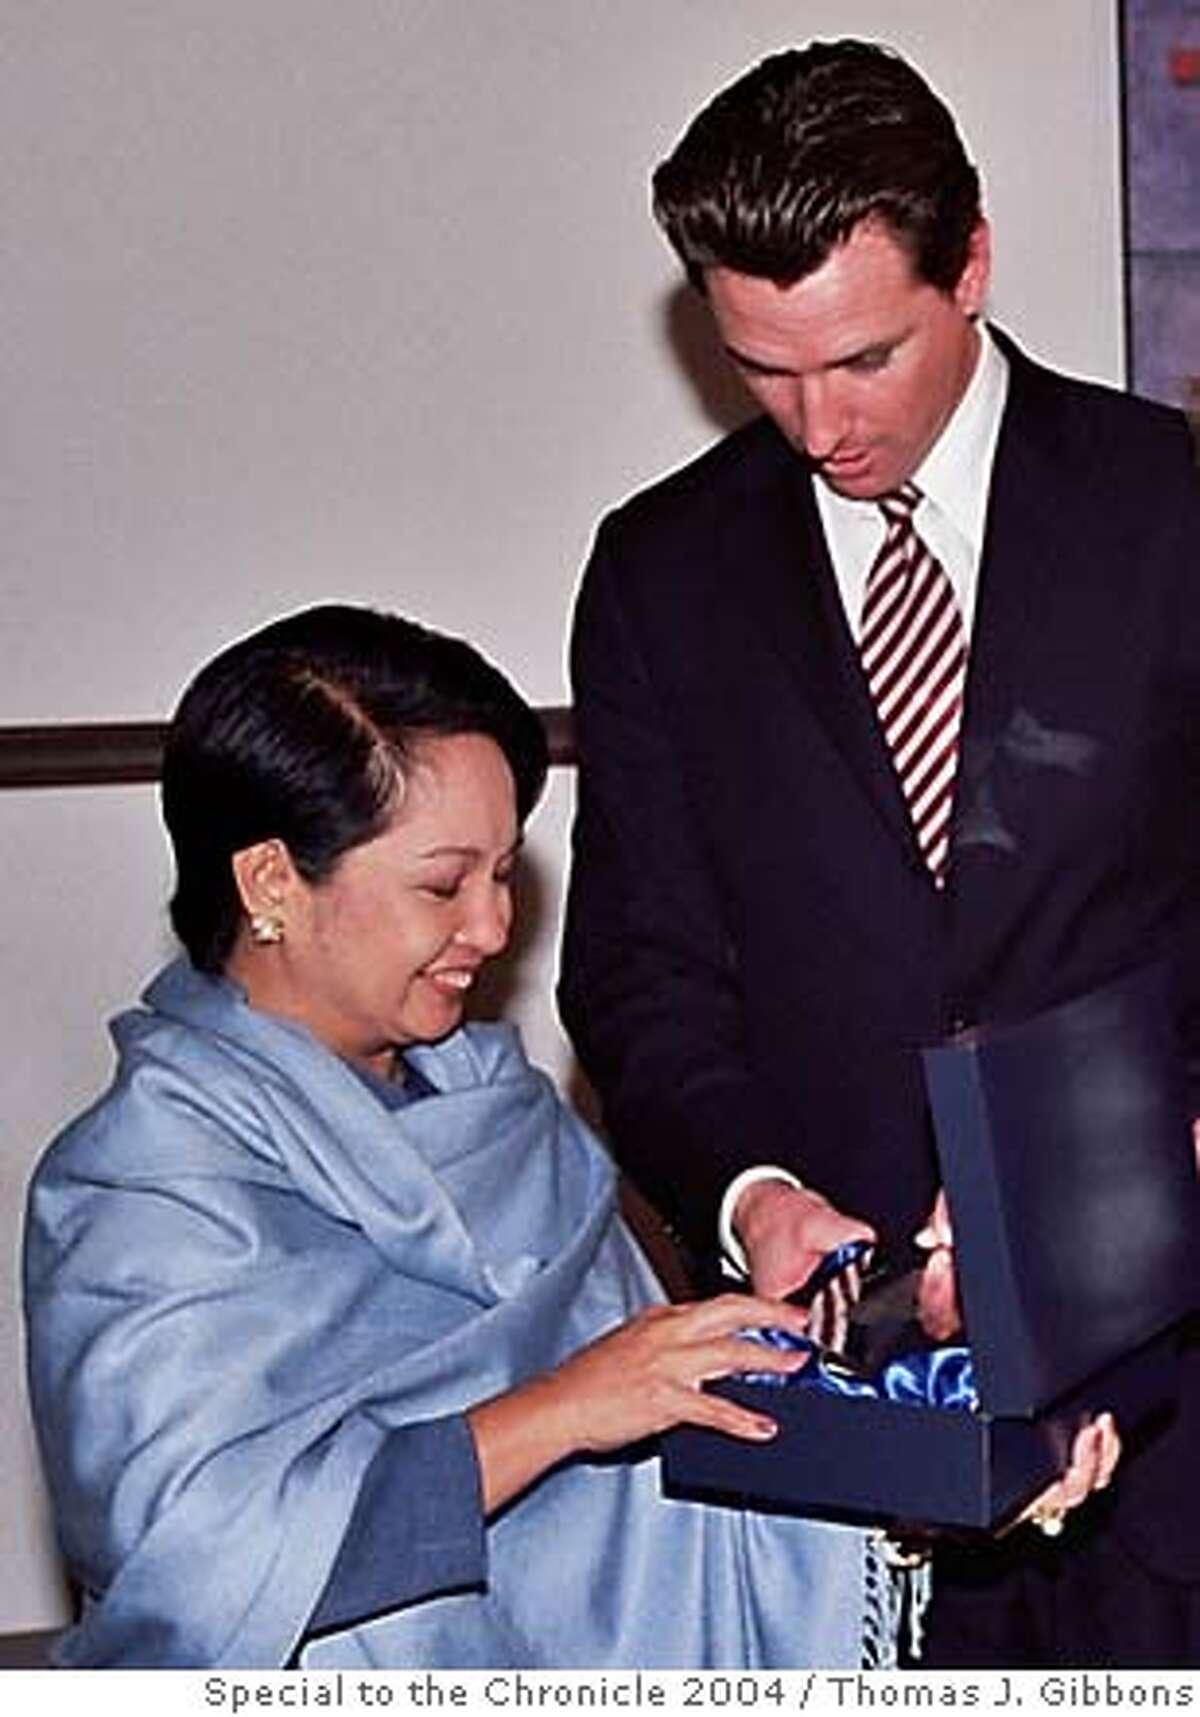 Left to Right: President Arroyo, Maror Gavin Newsom and Charlotte Shultz at USF. Ran on: 11-28-2004 Photo caption